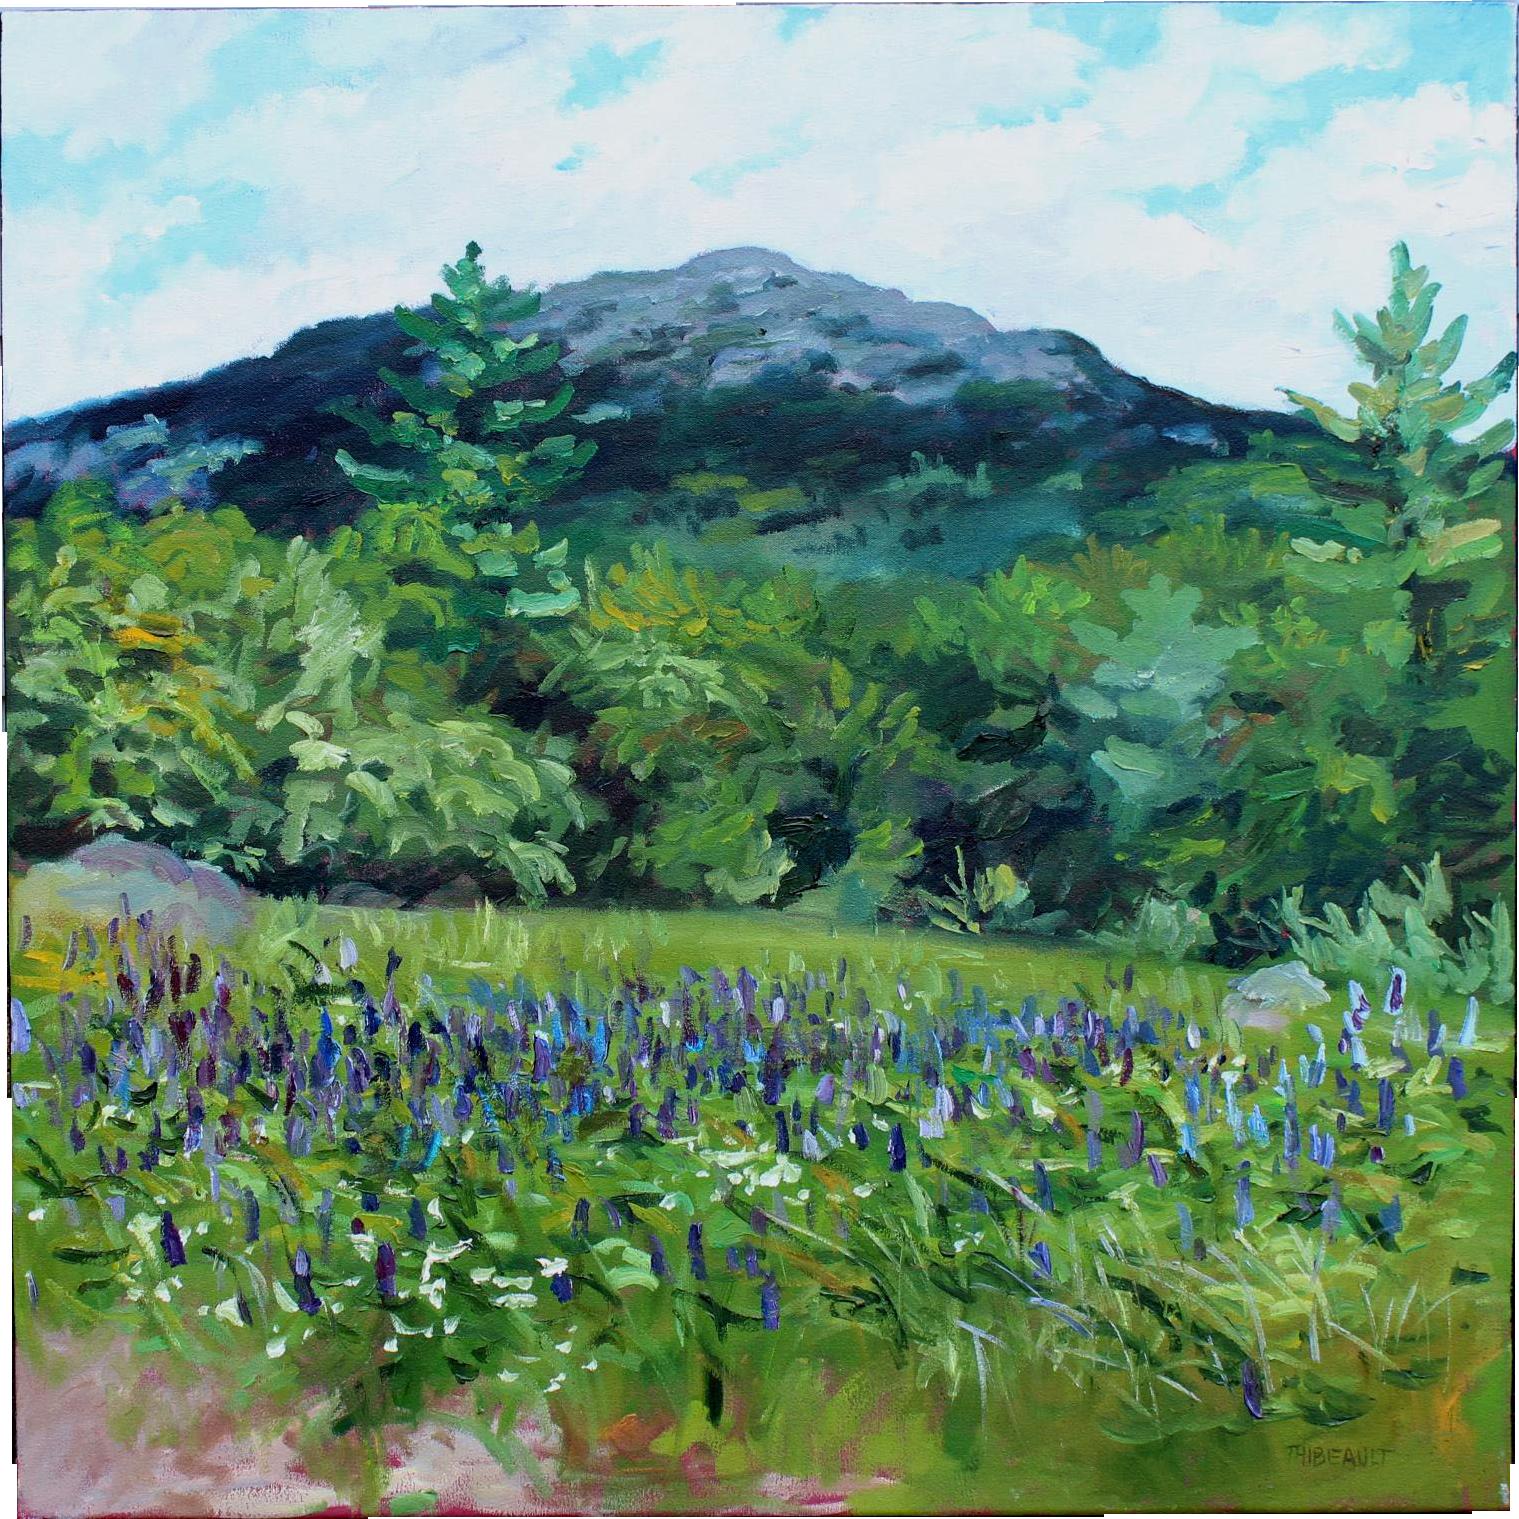 Daniel Thibeault Oil Painting Landscape of Mount Monadnock